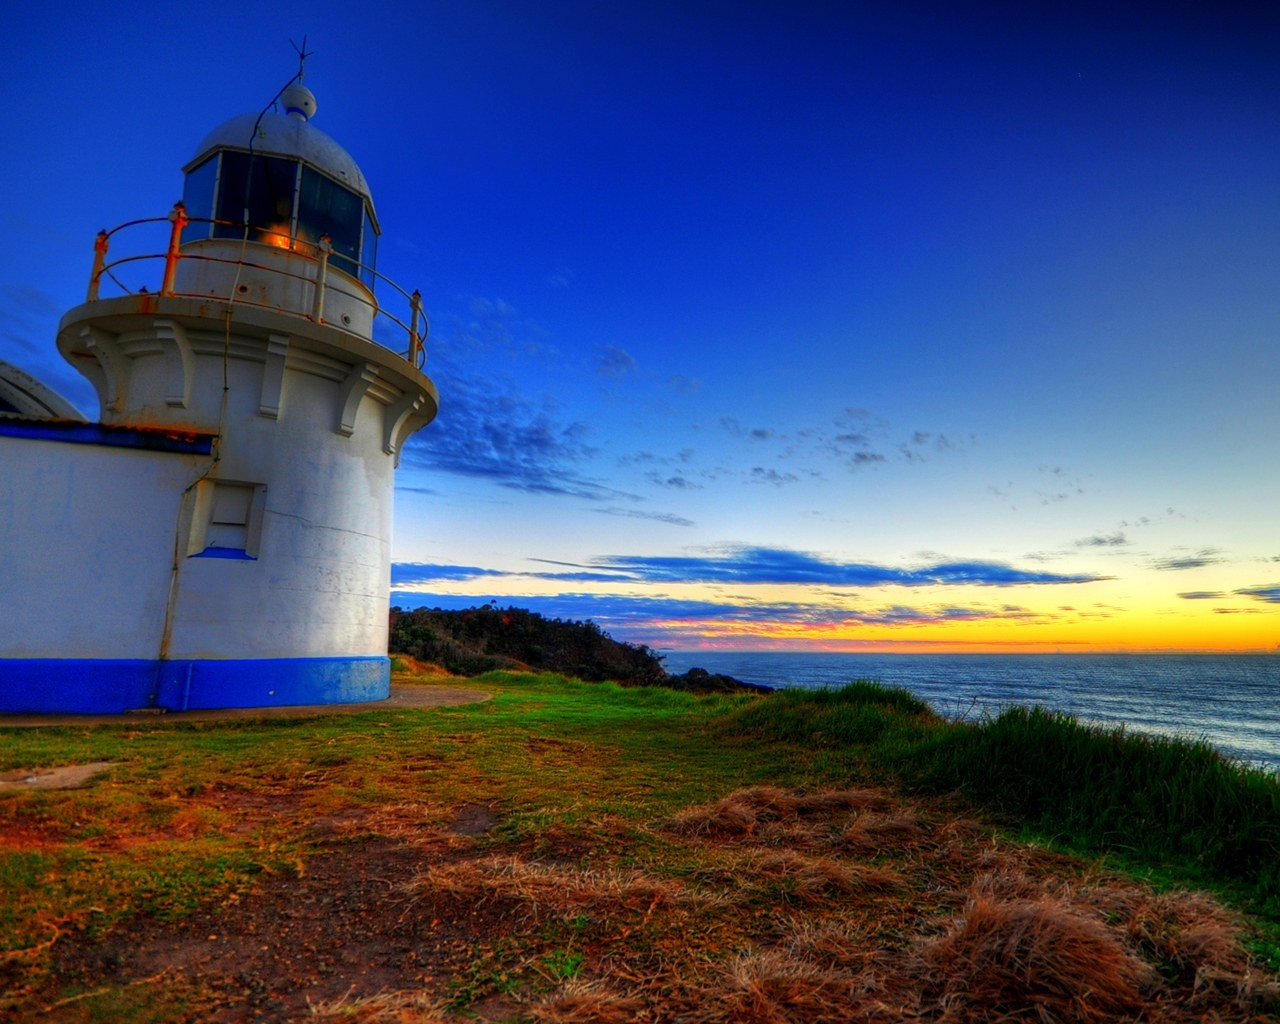 hdr澳洲悉尼风景摄影集